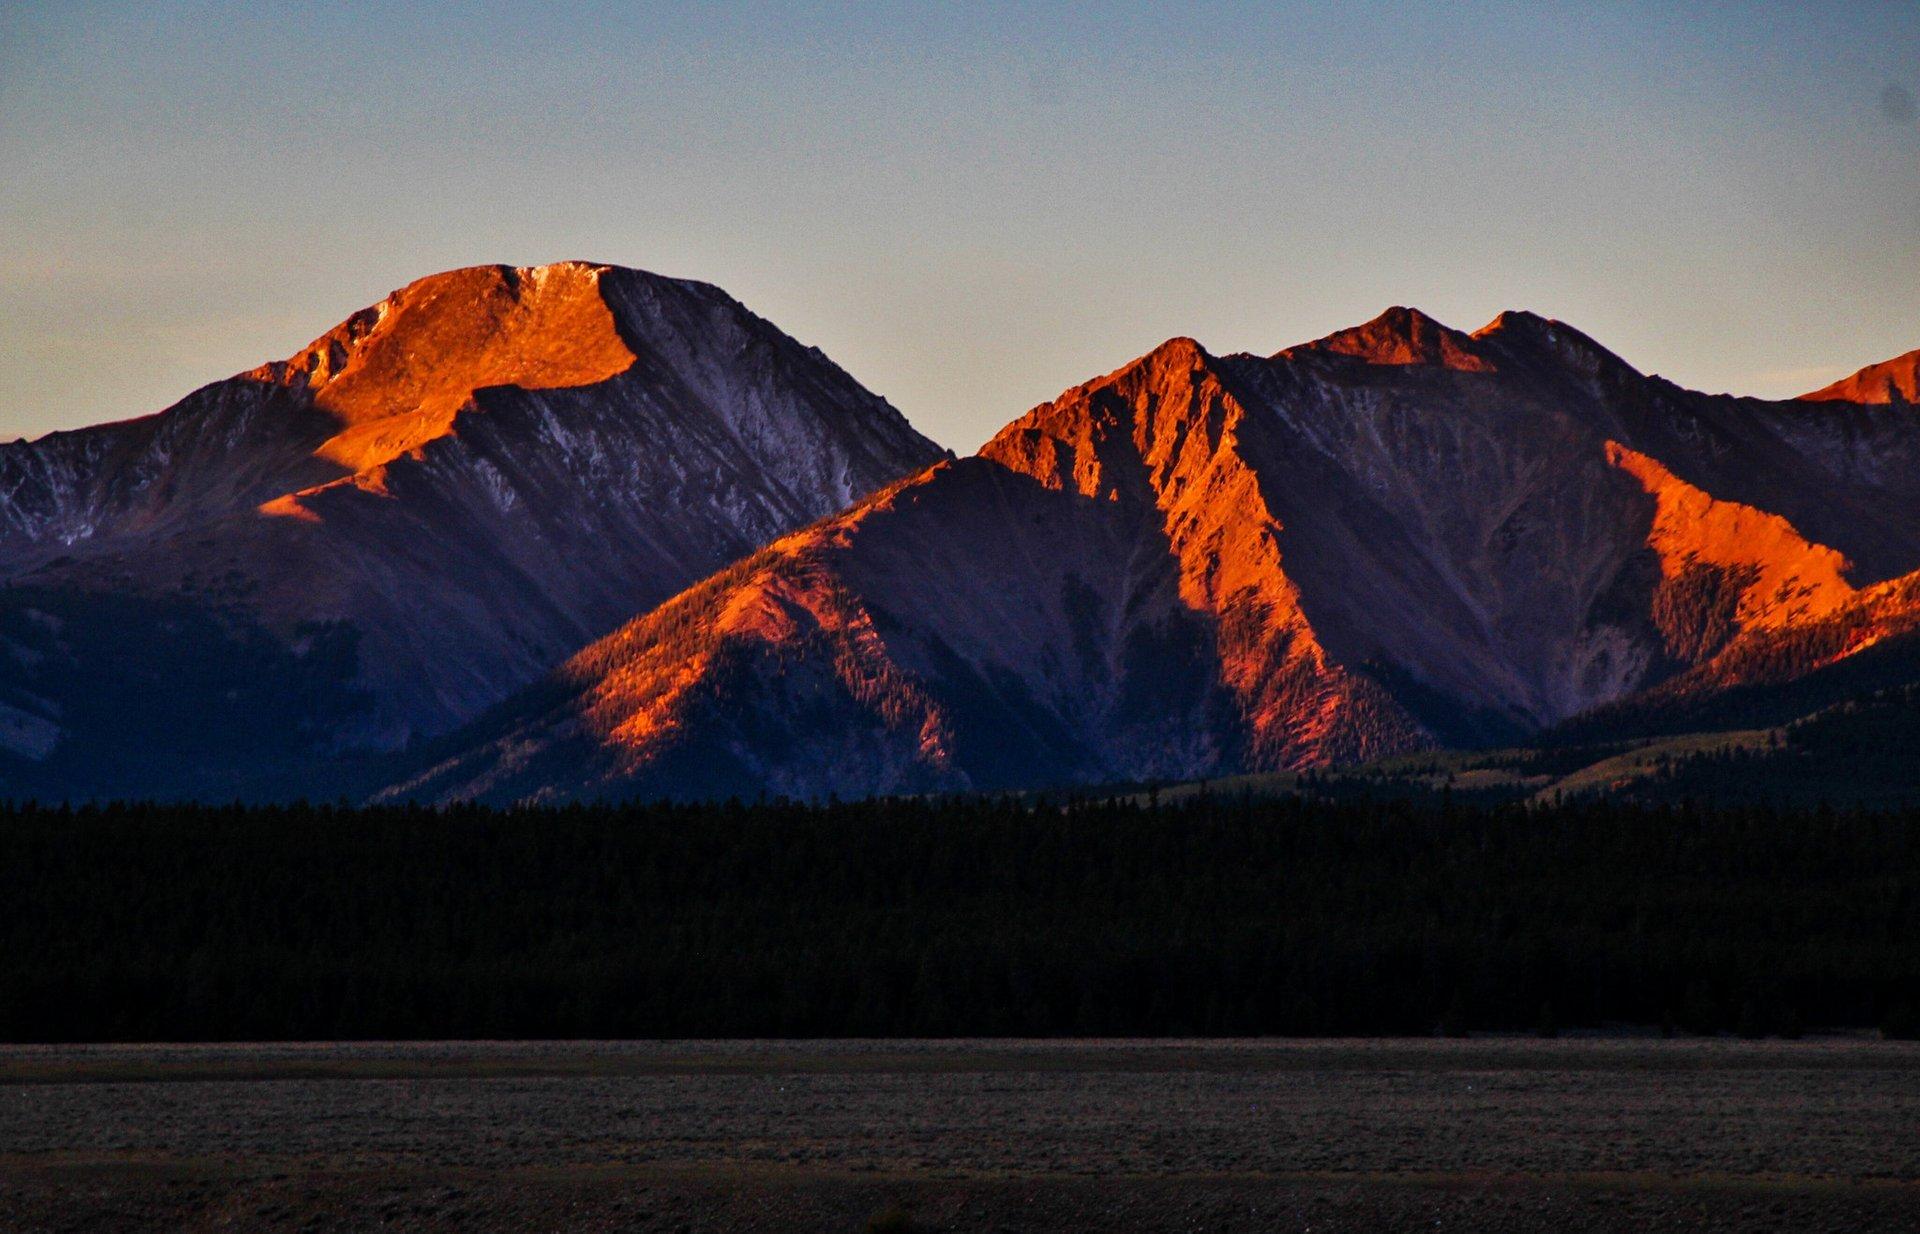 Mt. Elbert and Mt. Massive, Sunrise 2020